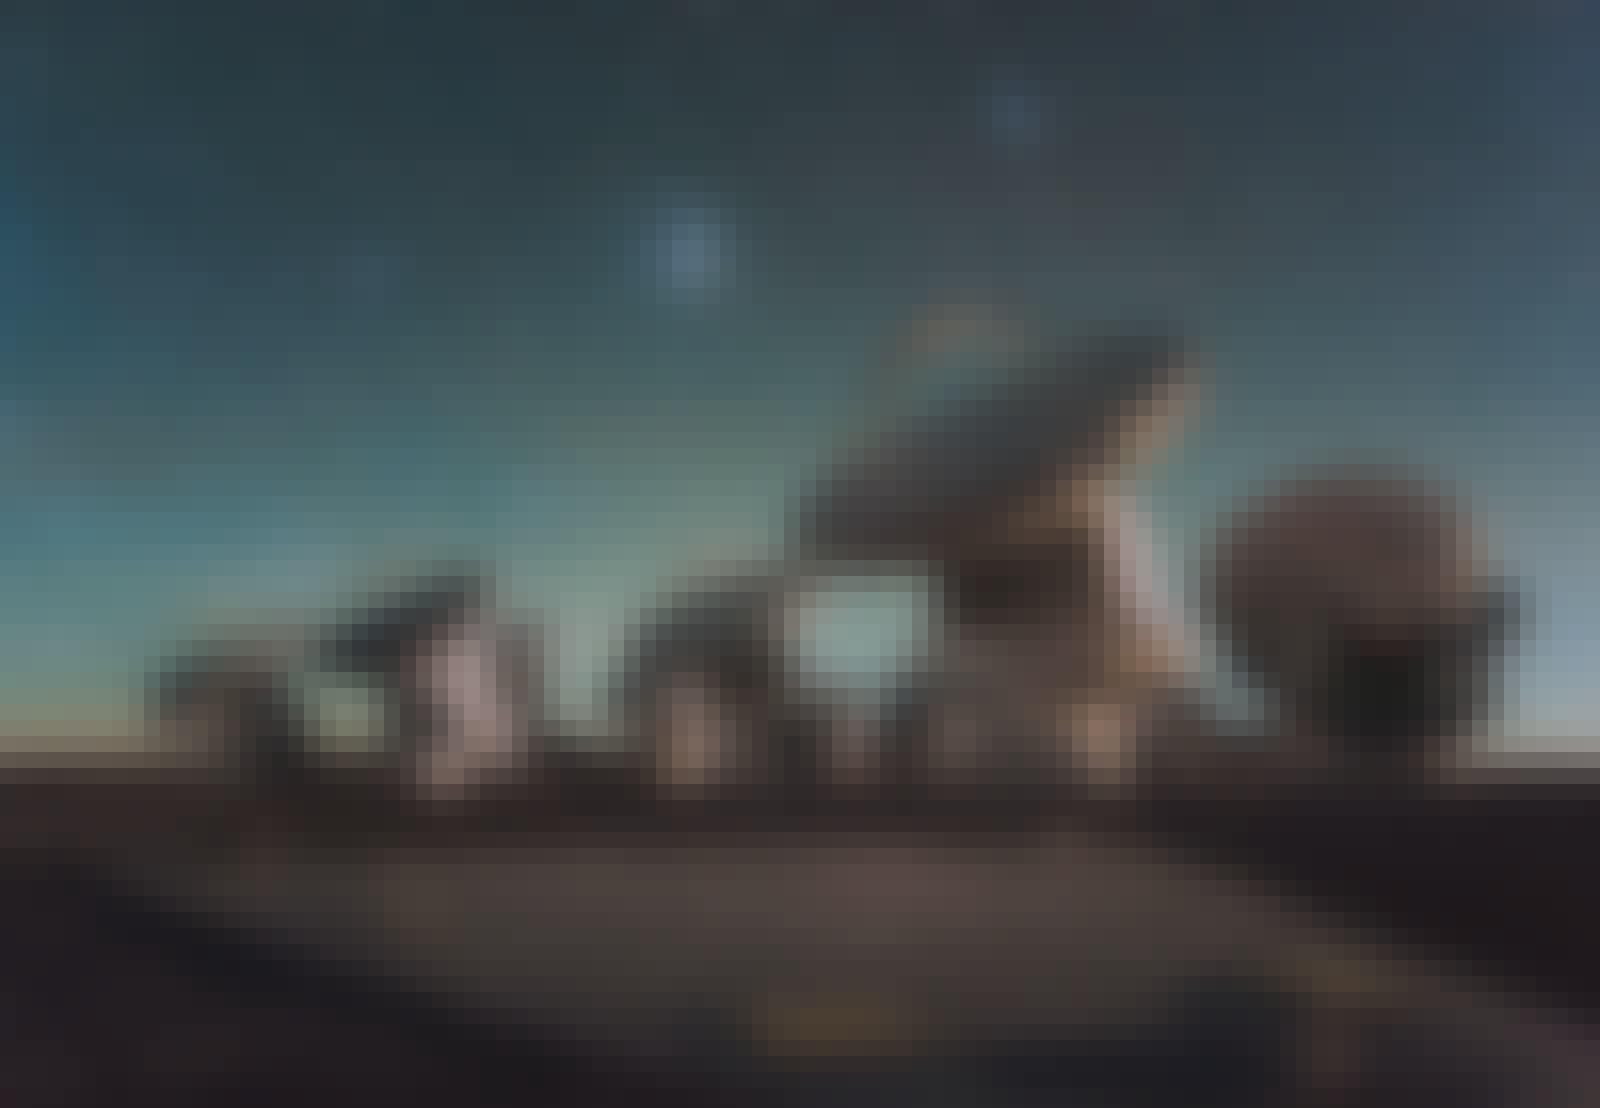 ALMA-teleskopet Chile